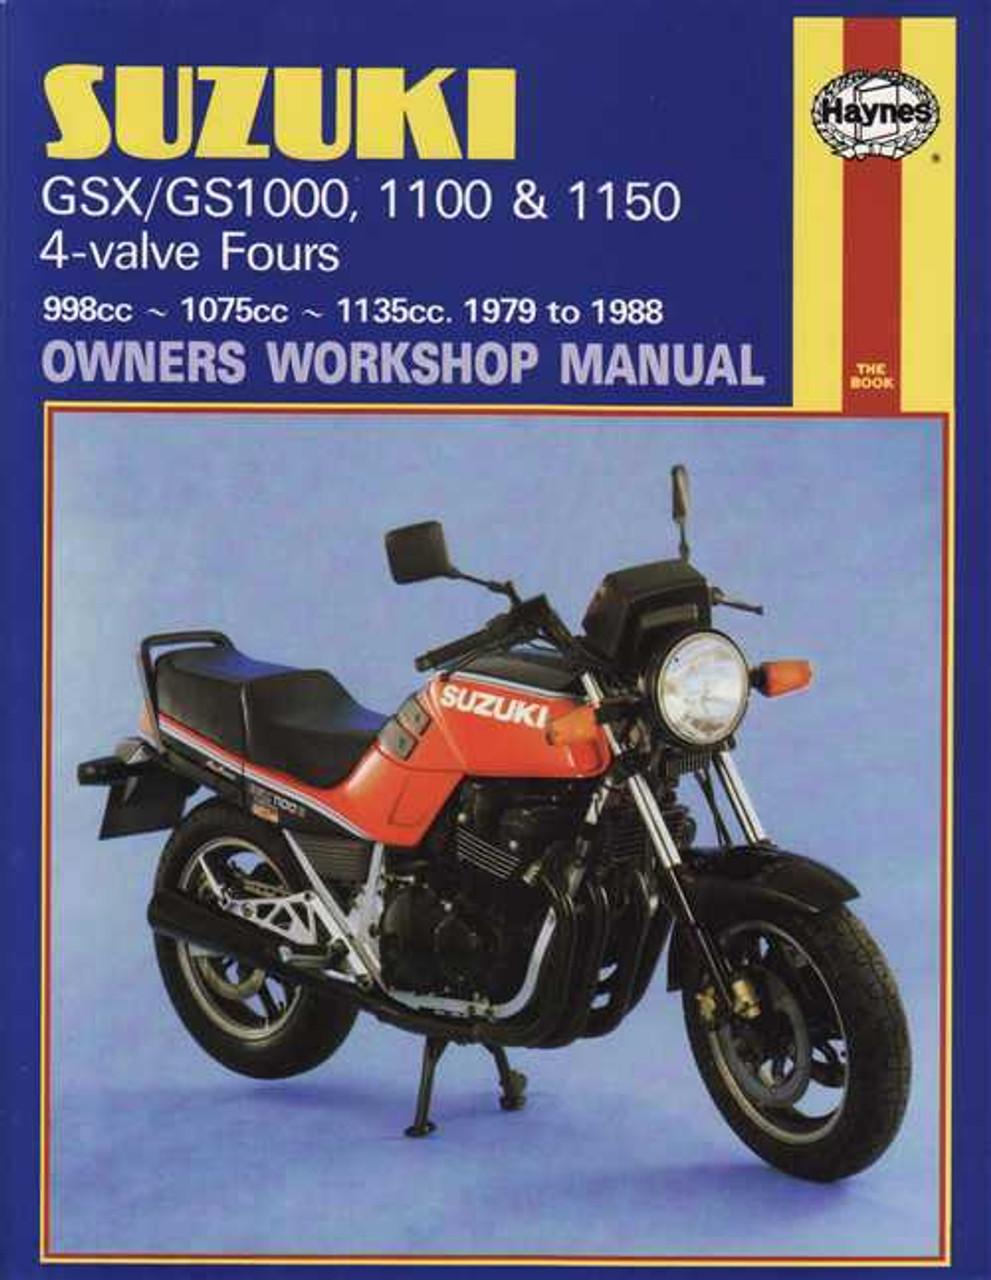 1987 Suzuki Gsx 1100 F Wiring Diagram from cdn11.bigcommerce.com